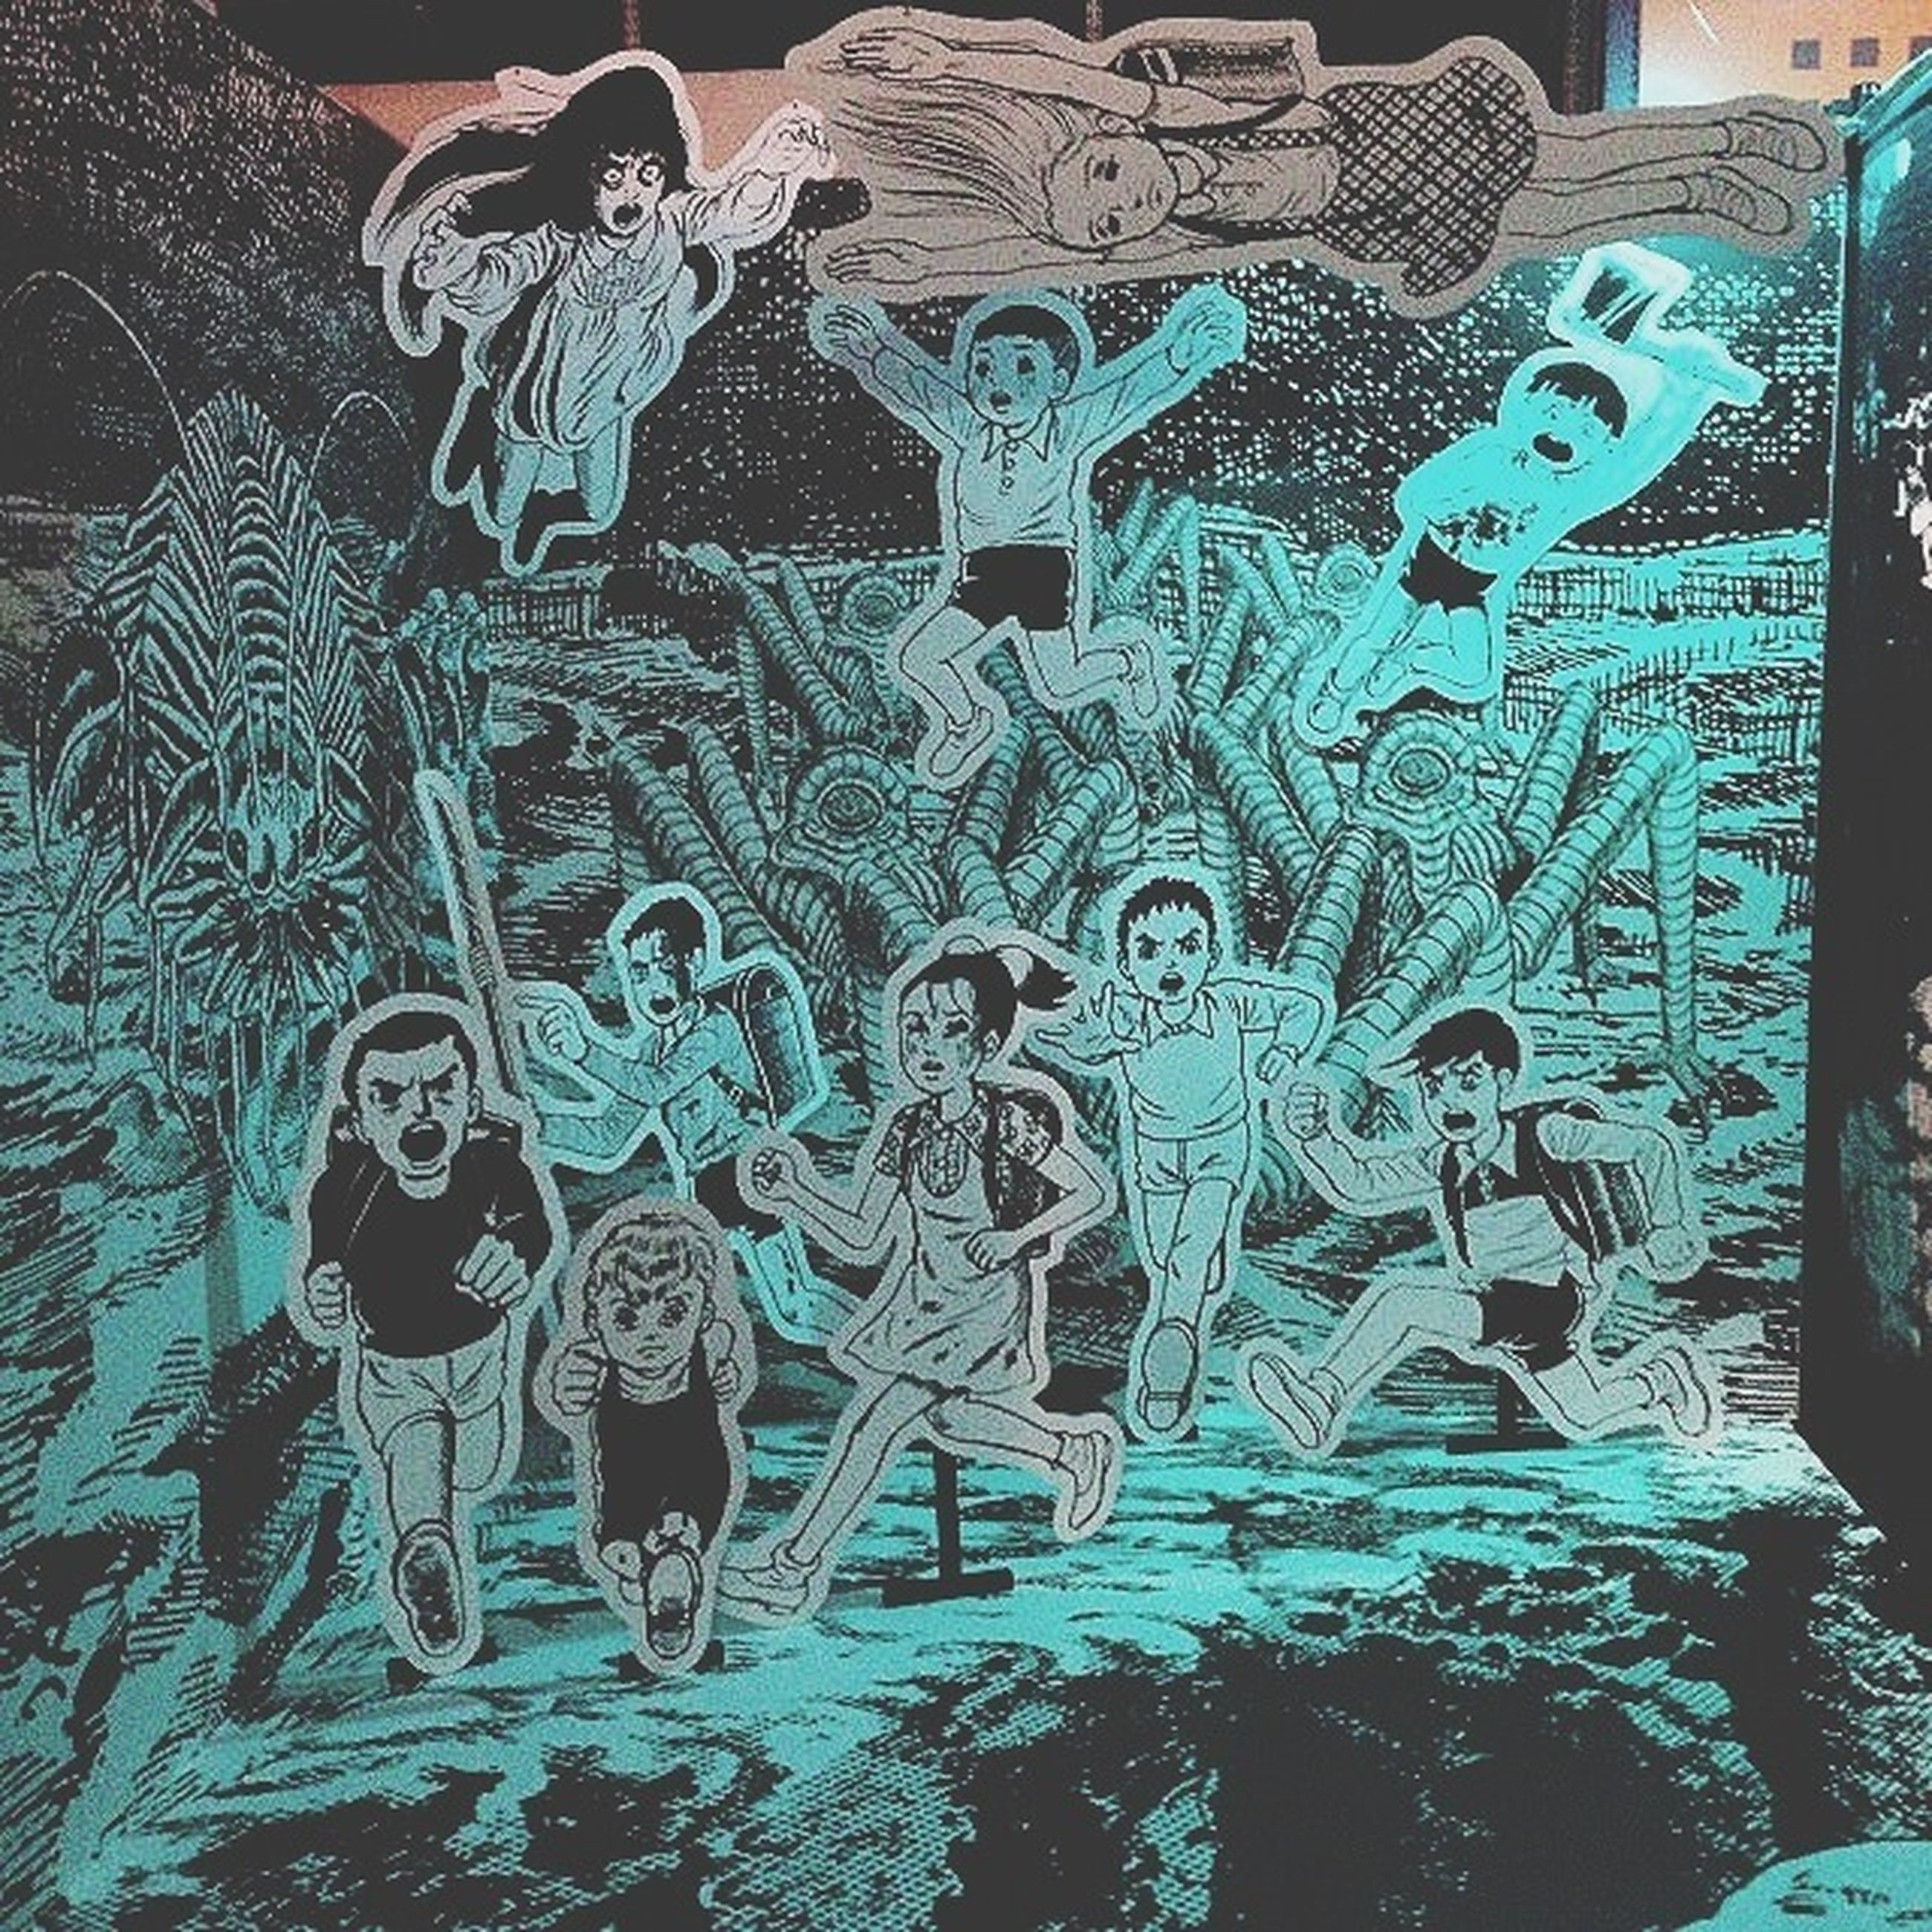 art, art and craft, creativity, human representation, statue, sculpture, built structure, architecture, graffiti, pattern, craft, design, animal representation, wall - building feature, blue, day, indoors